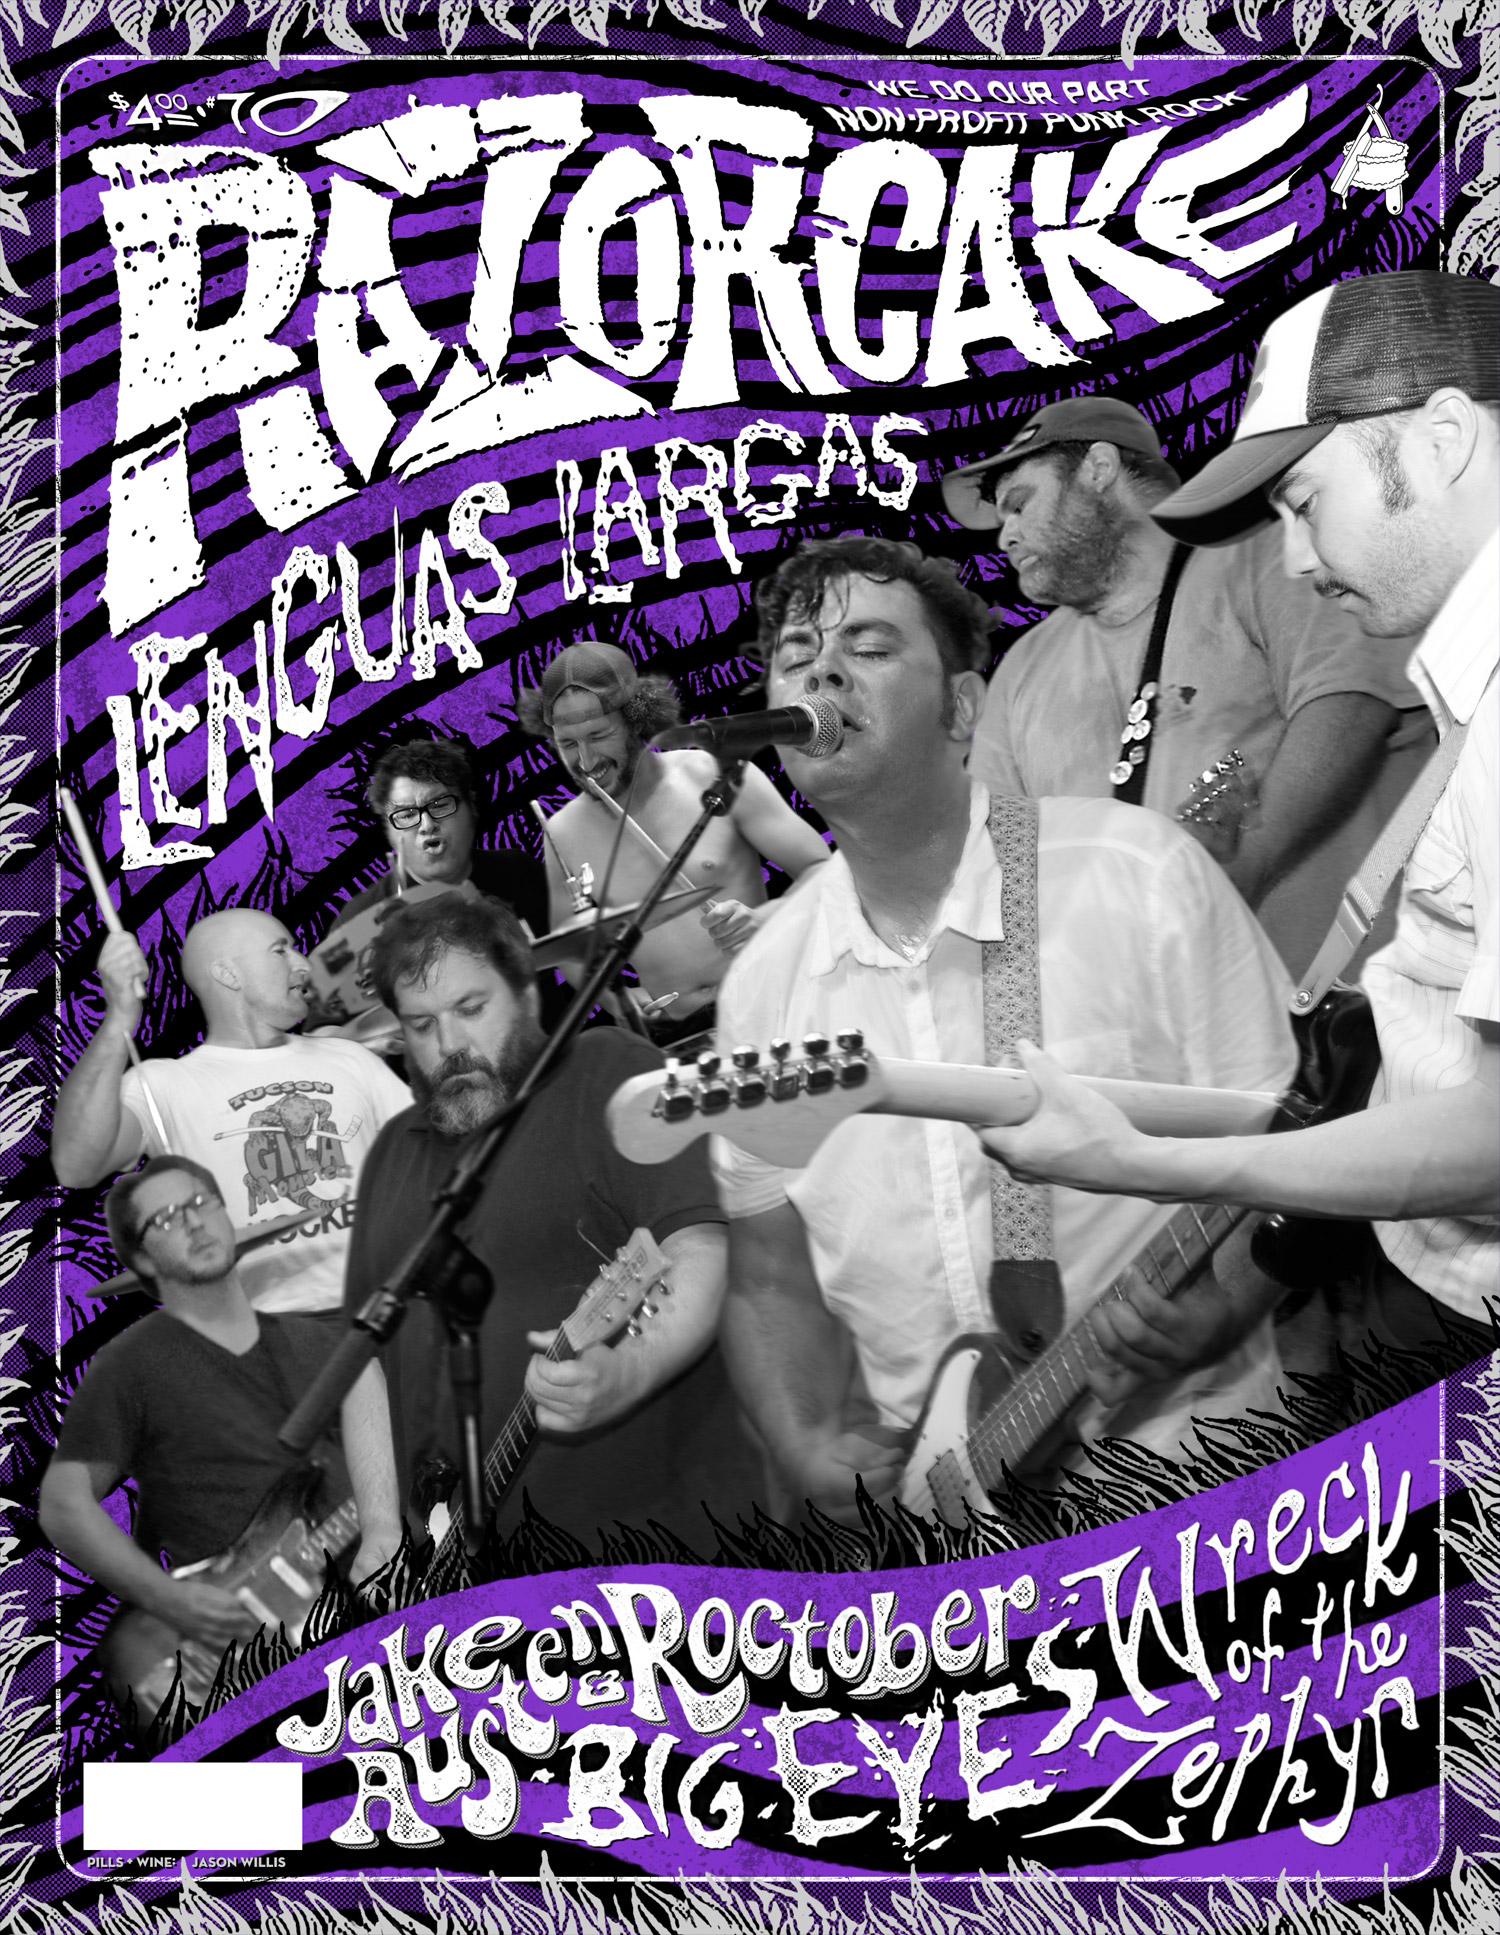 Razorcake 70 - Lenguas Largas Front Cover - Graphic Design